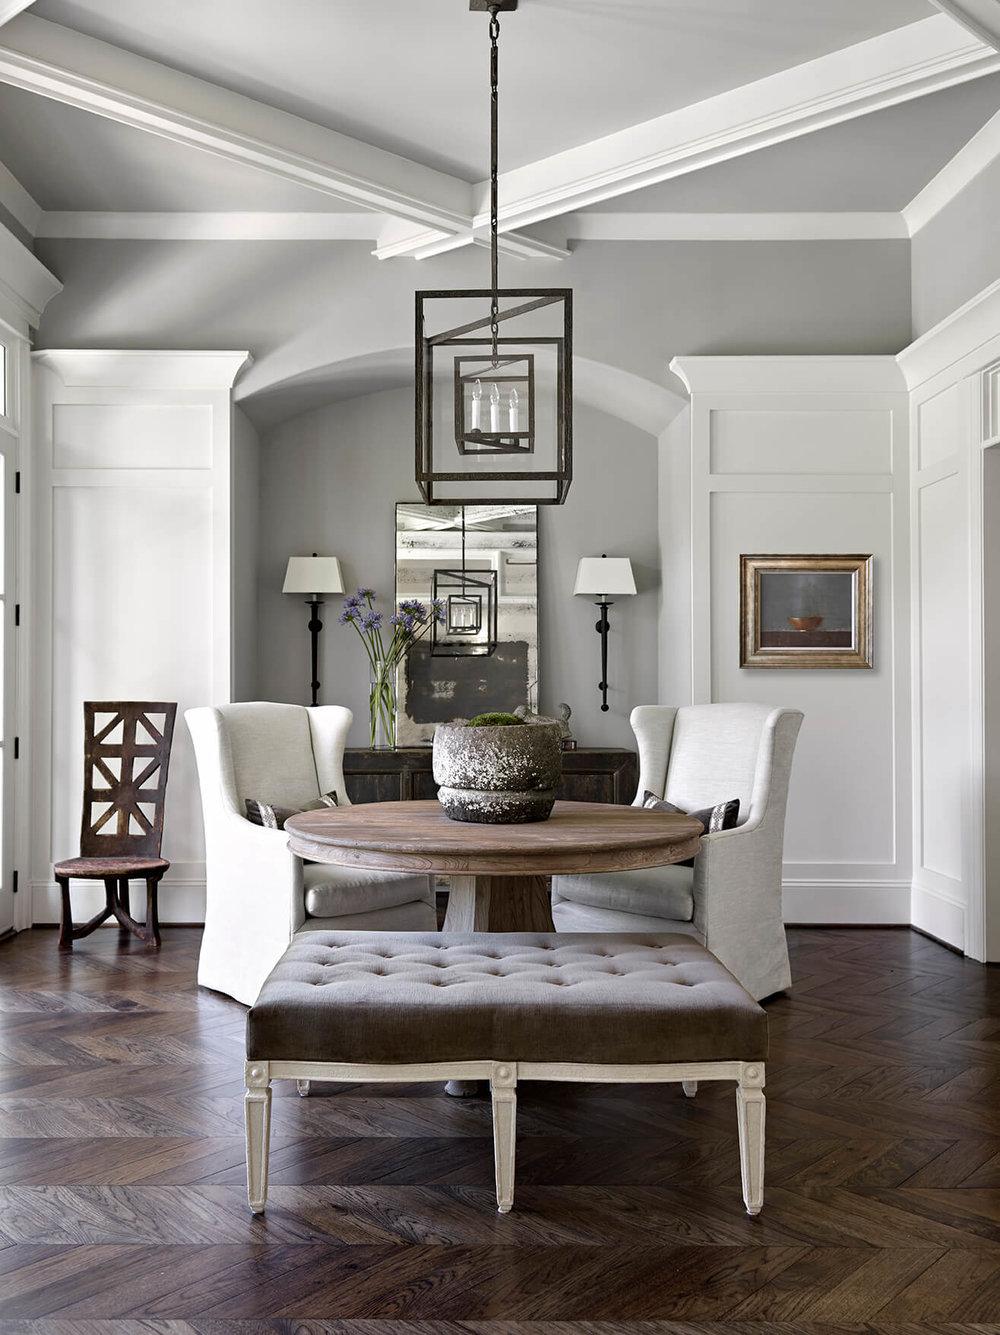 small-dining-area-dark-floor-bench-white-walls-rustic-contemporary-bureau-interior-design-nashville-tn.jpg